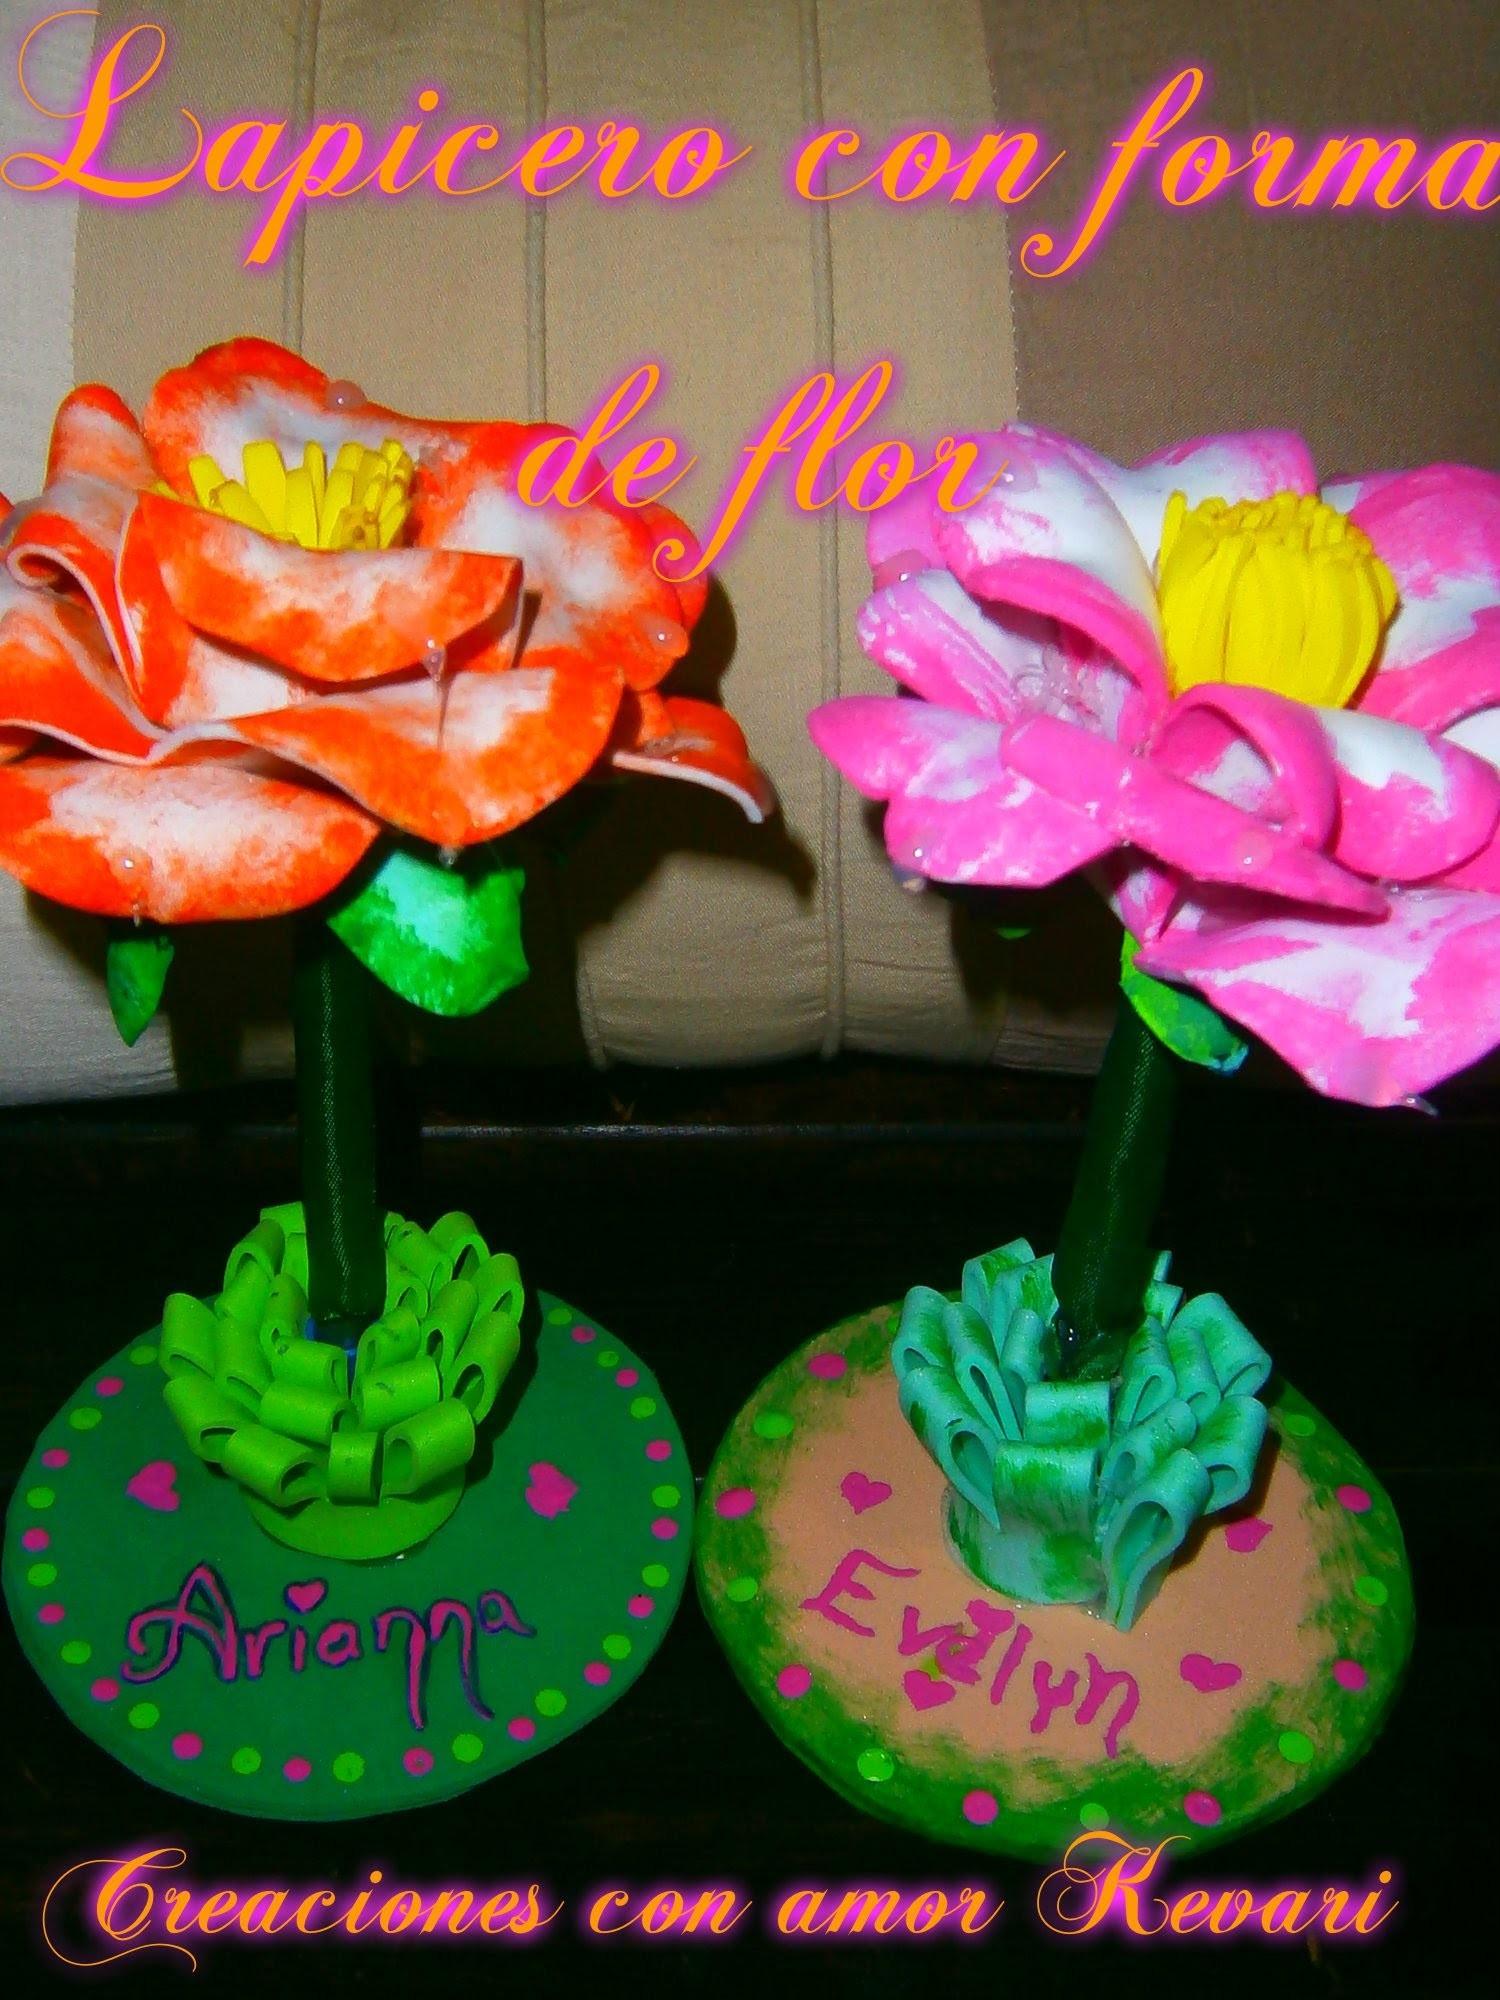 Lapiceros Decorado con forma de Flor. Flower Pens